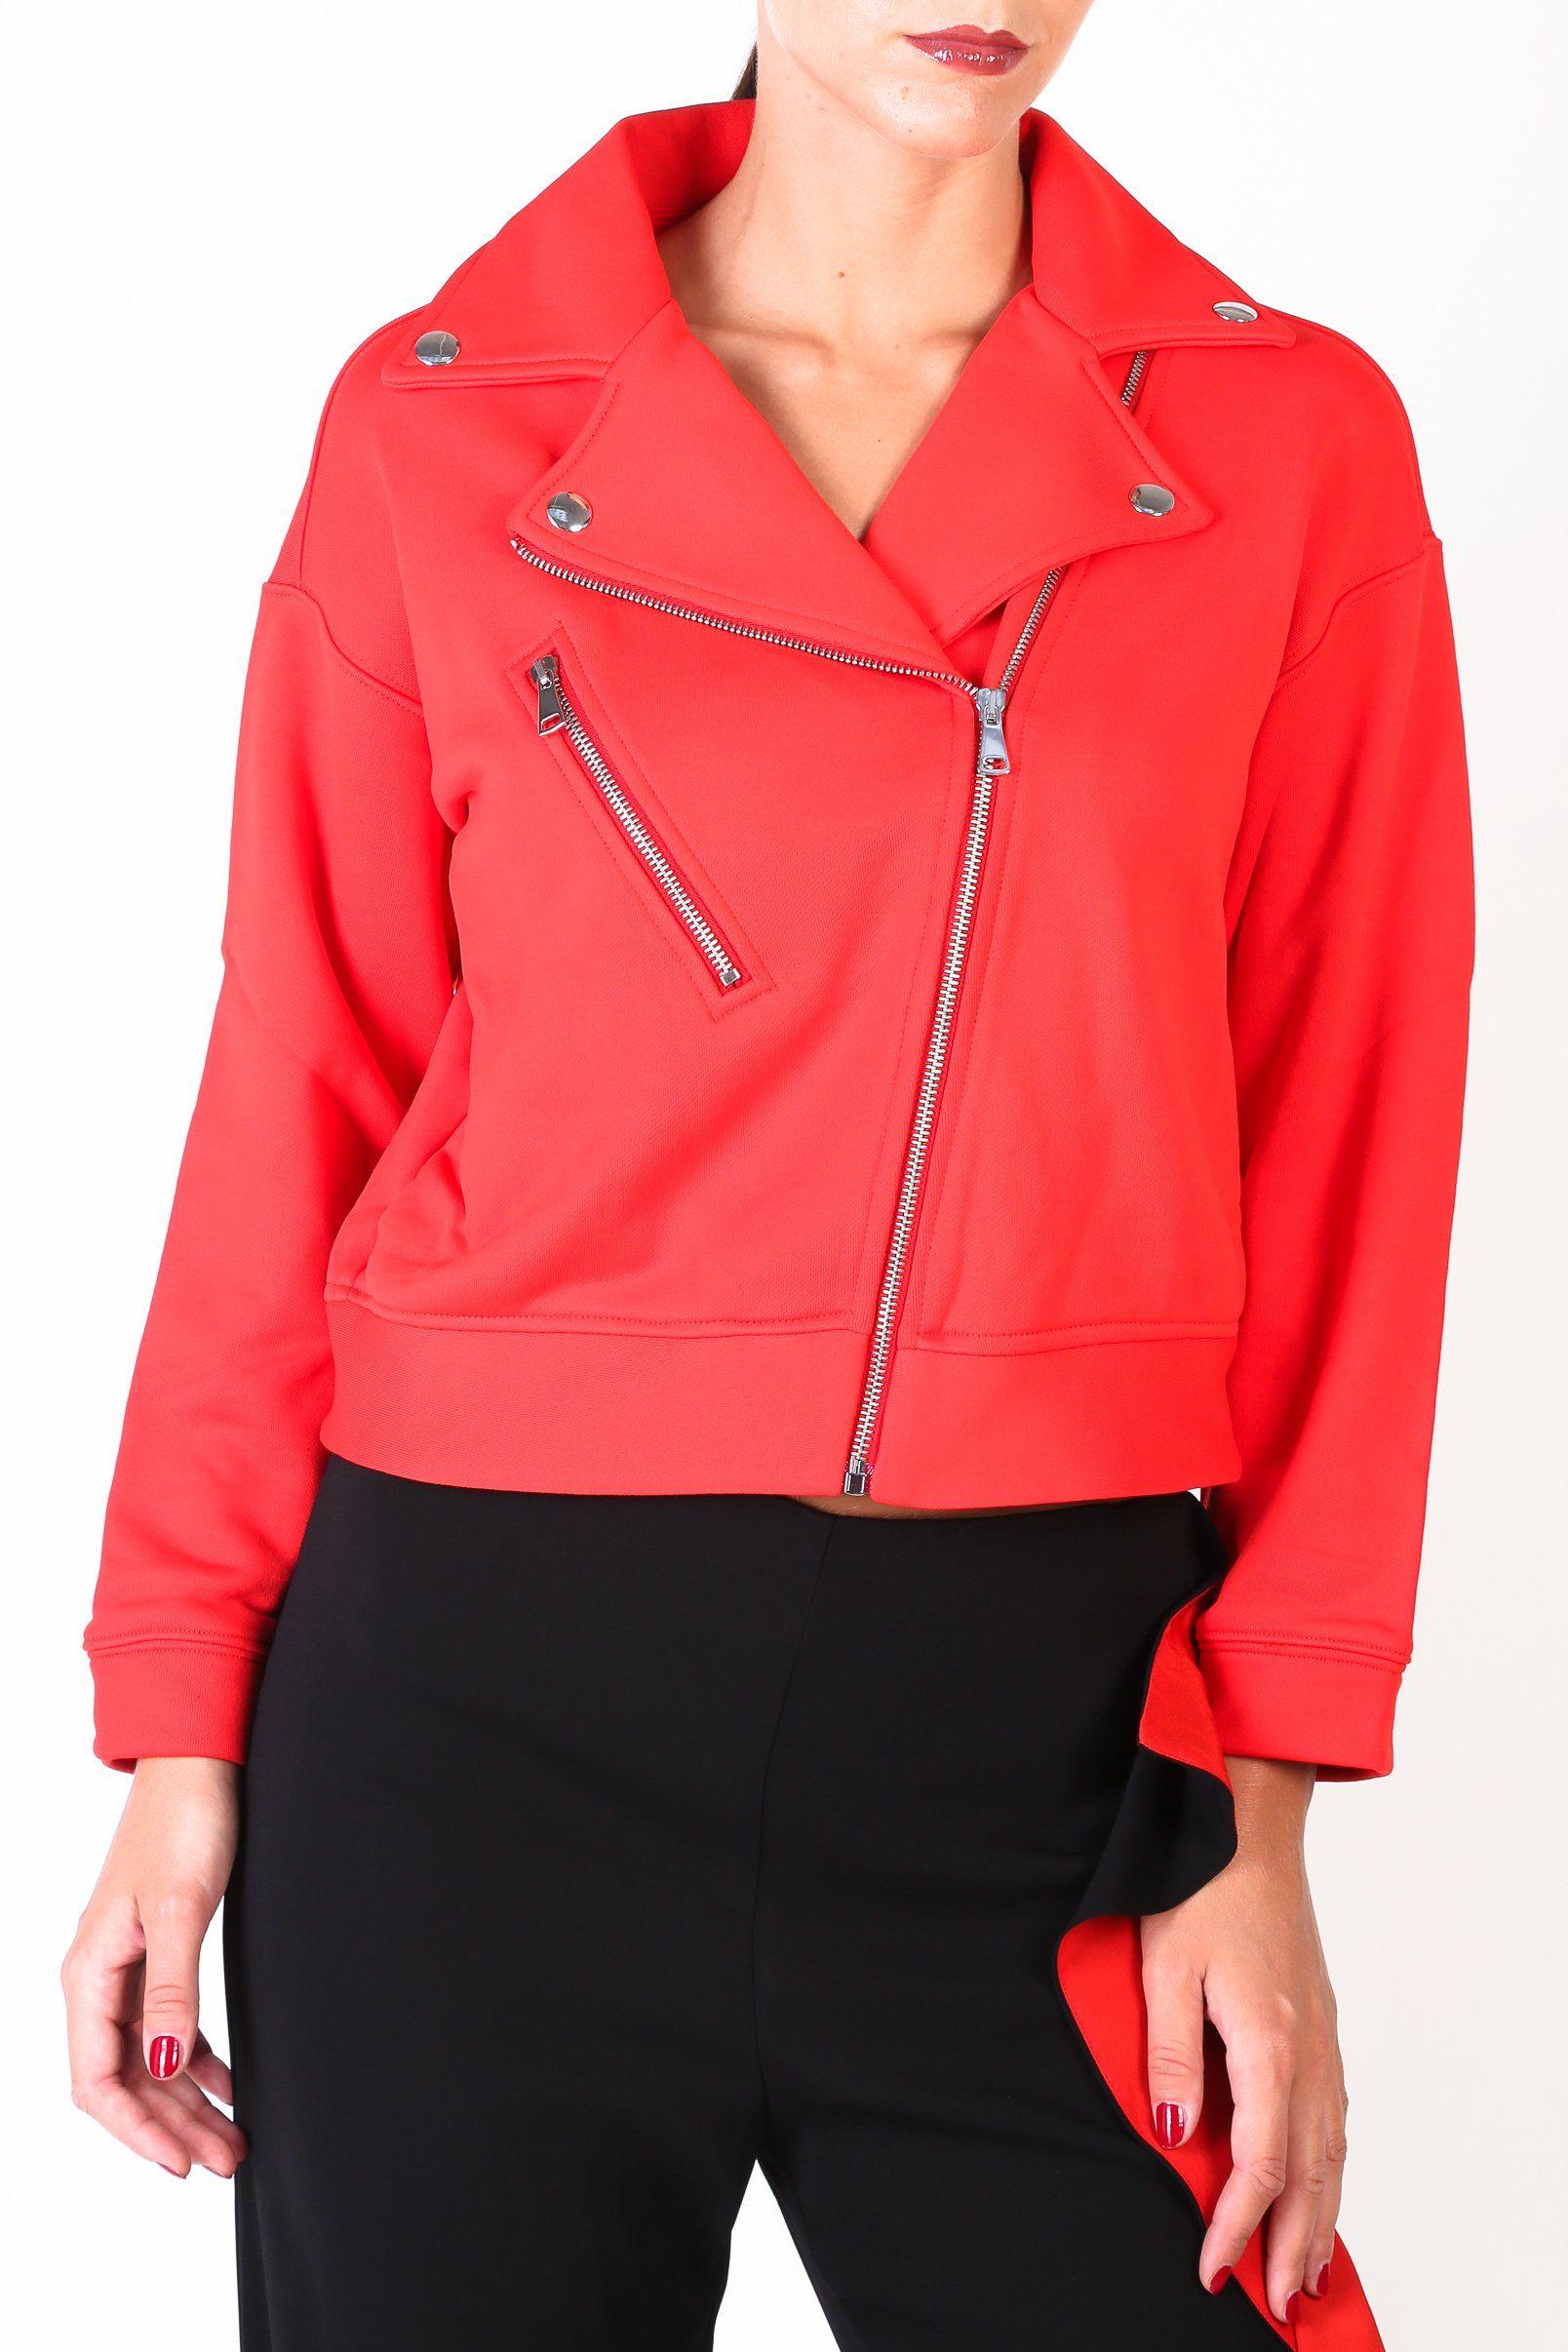 2018 In 1g1297 Outerwear Pinko Women 6235 Products Pinterest w6fxF